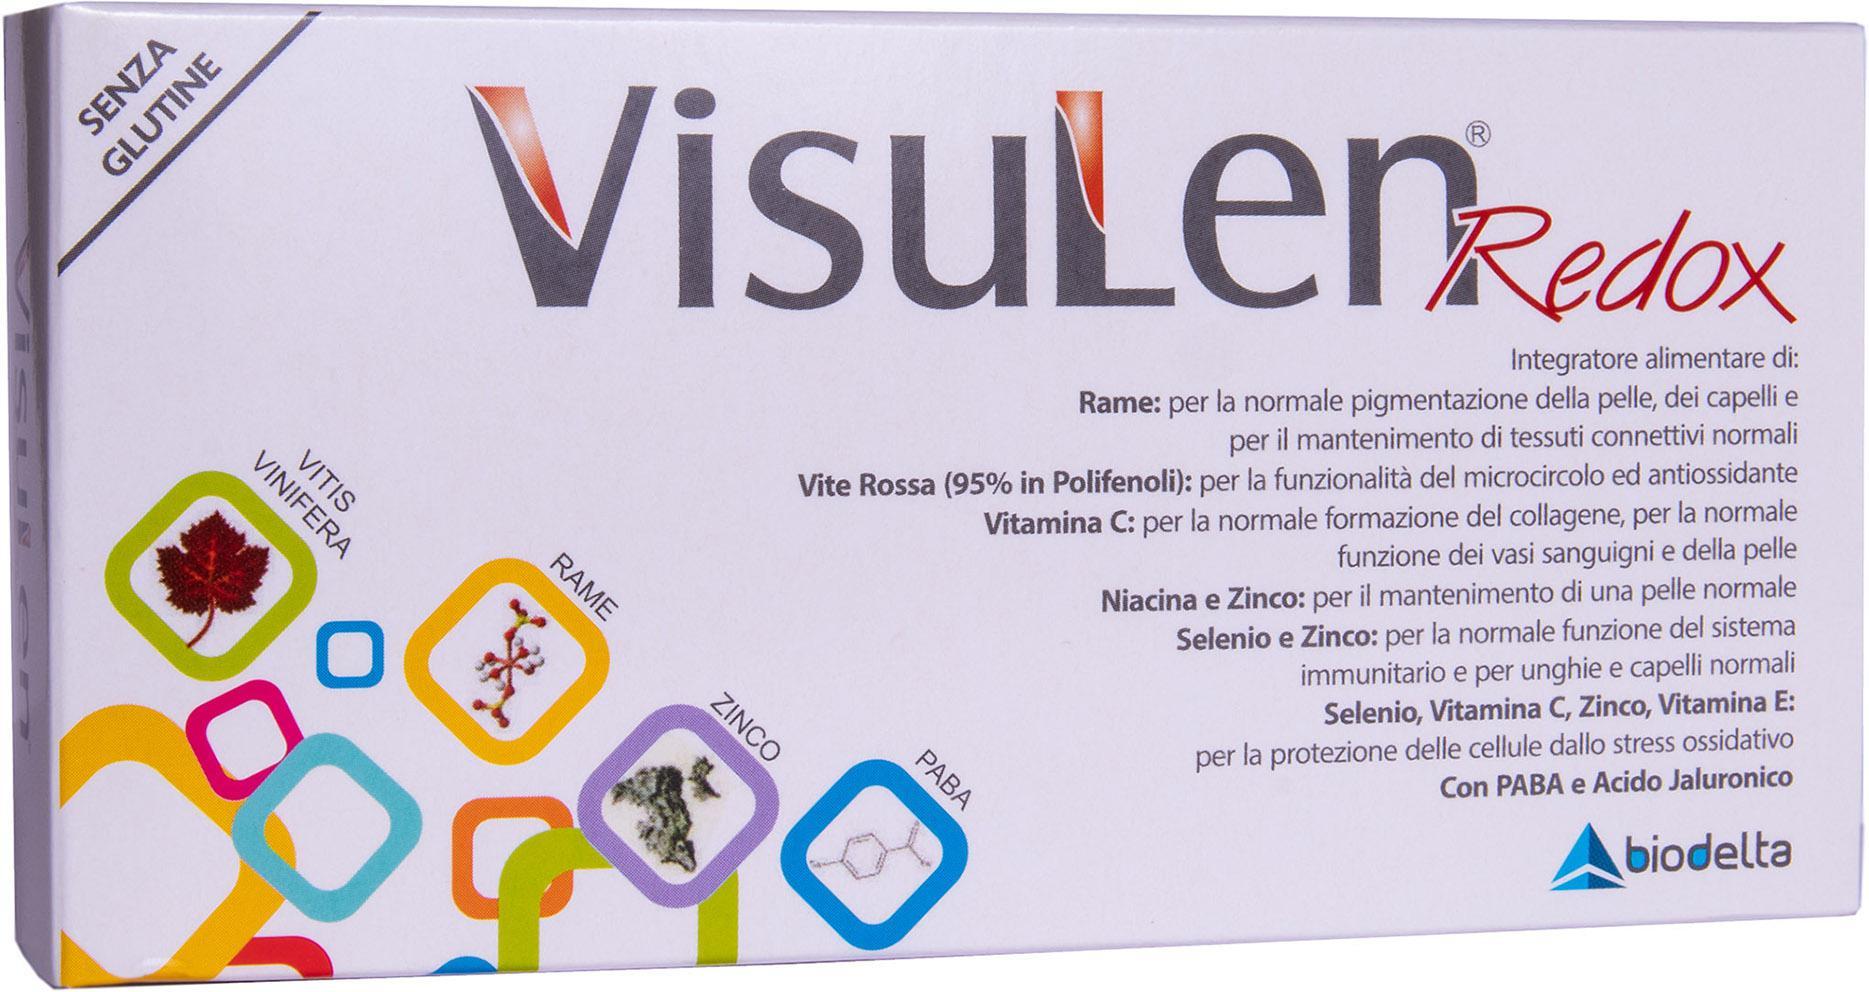 VisuLen® Redox